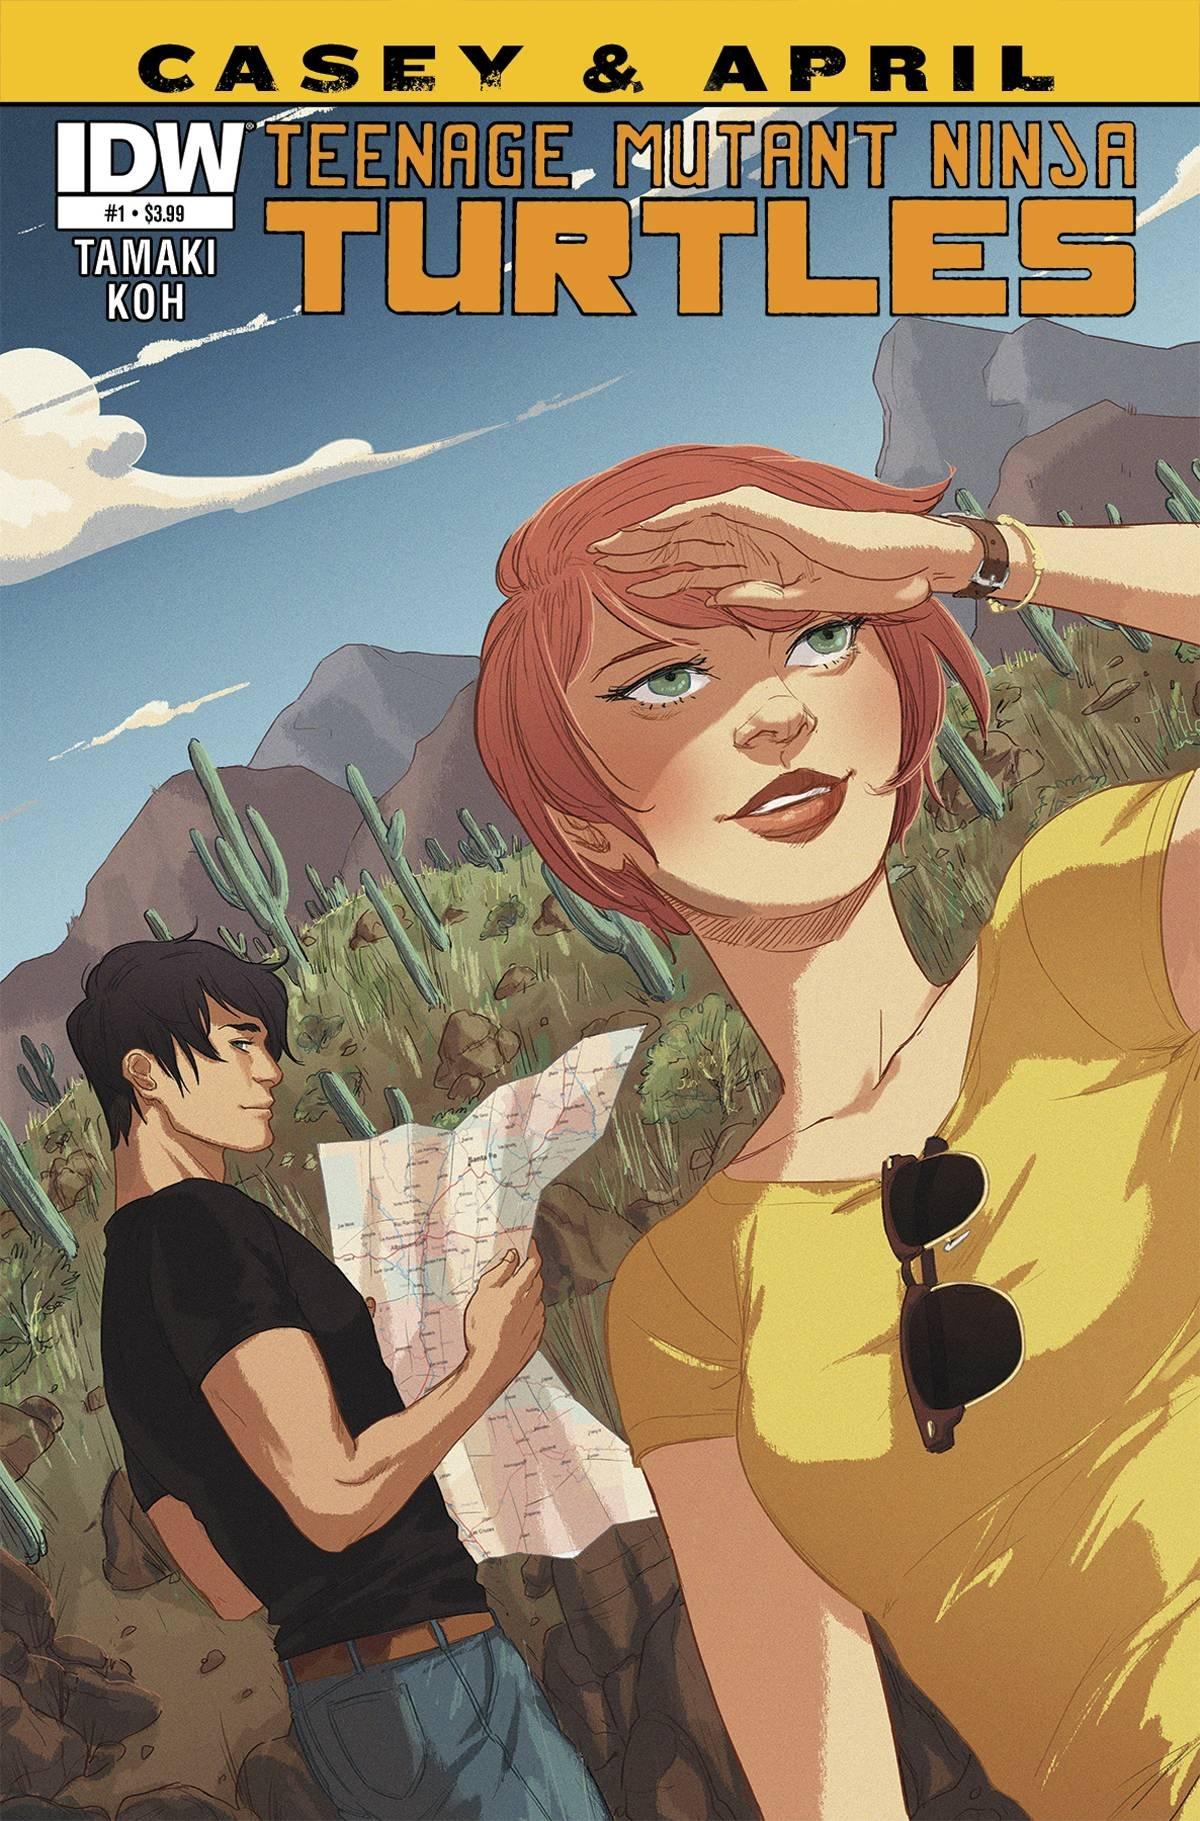 TEENAGE MUTANT NINJA TURTLES CASEY & APRIL #1 Of(4): Amazon ...